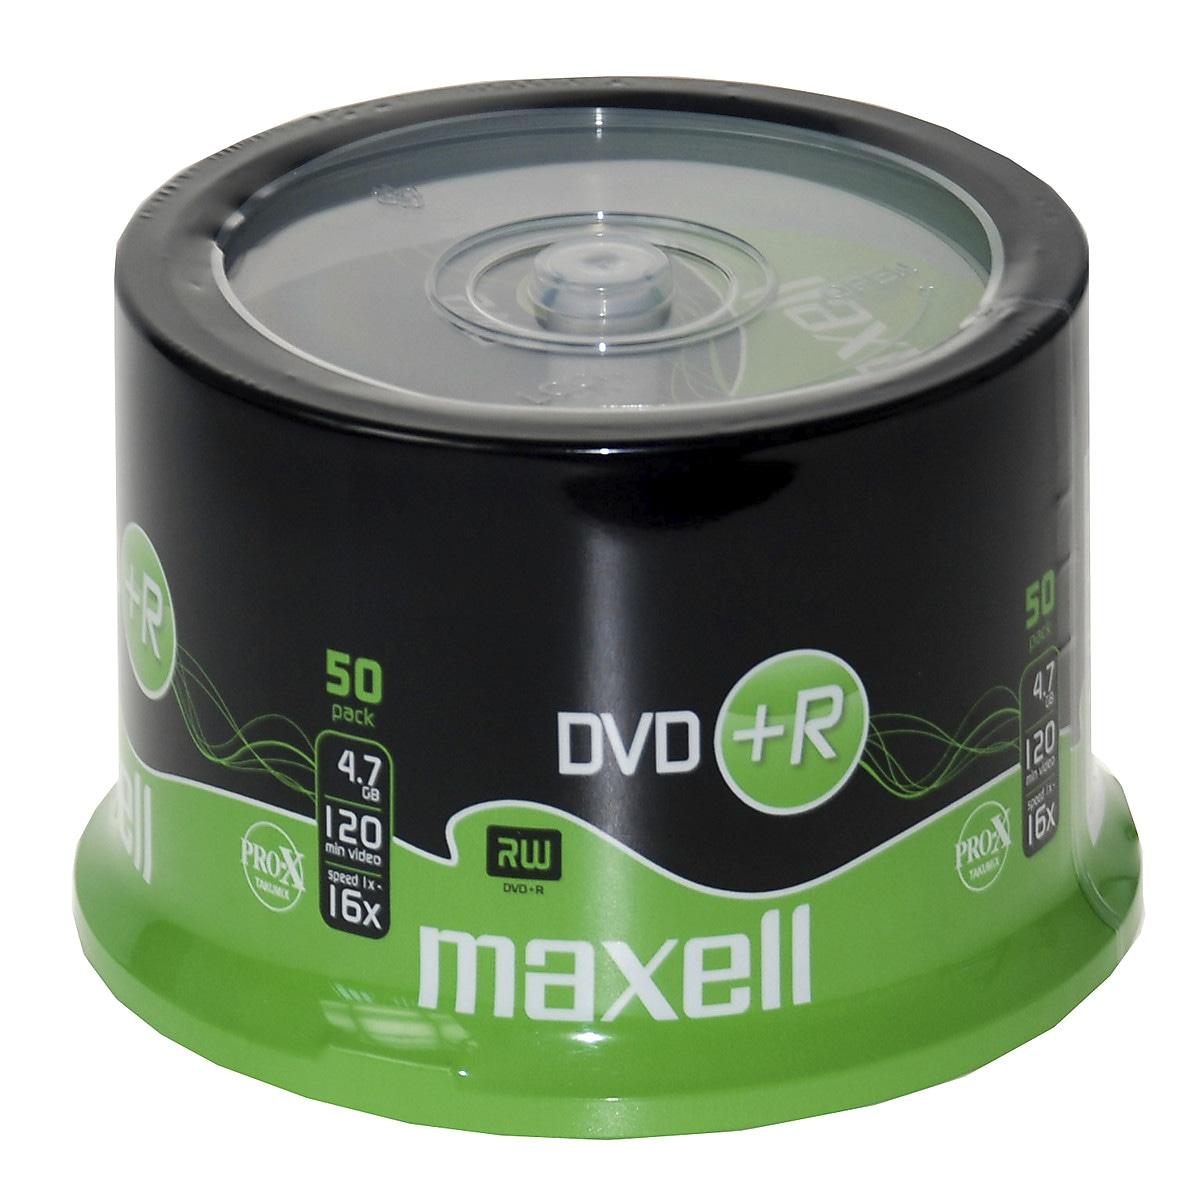 DVD R 4.7 GB